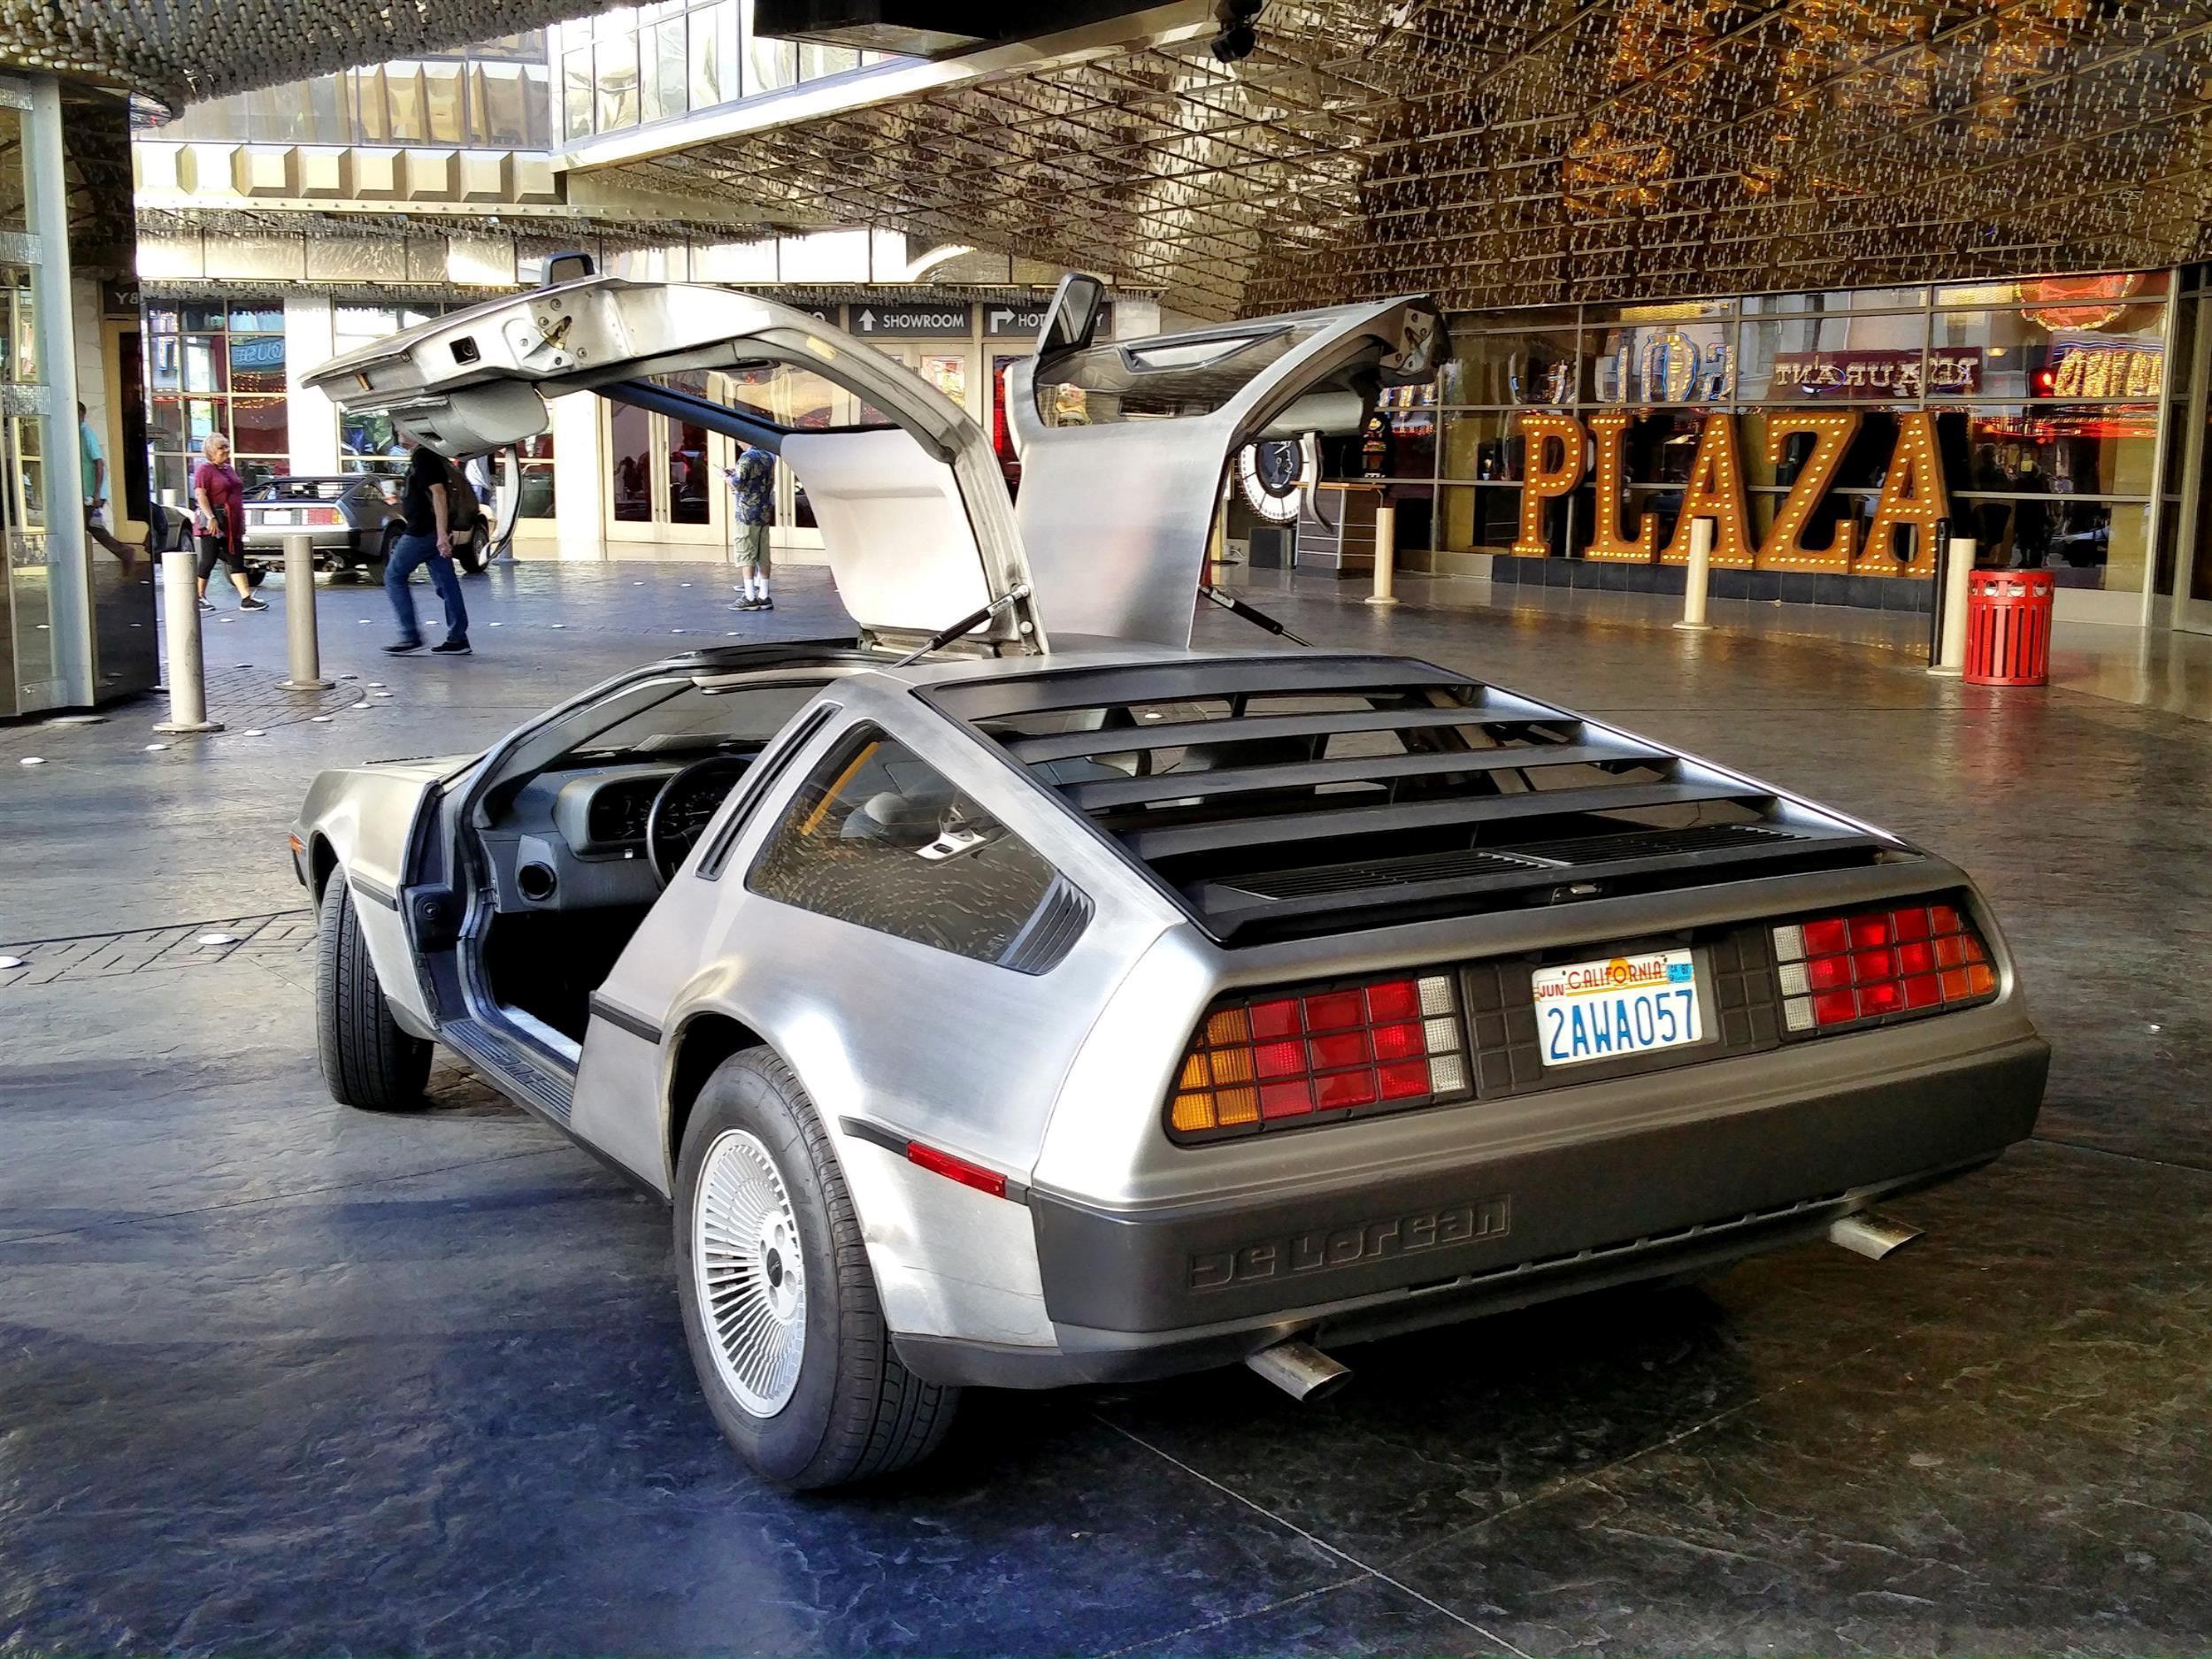 DeLorean Weekend, Las Vegas 2016 | DMC #10515